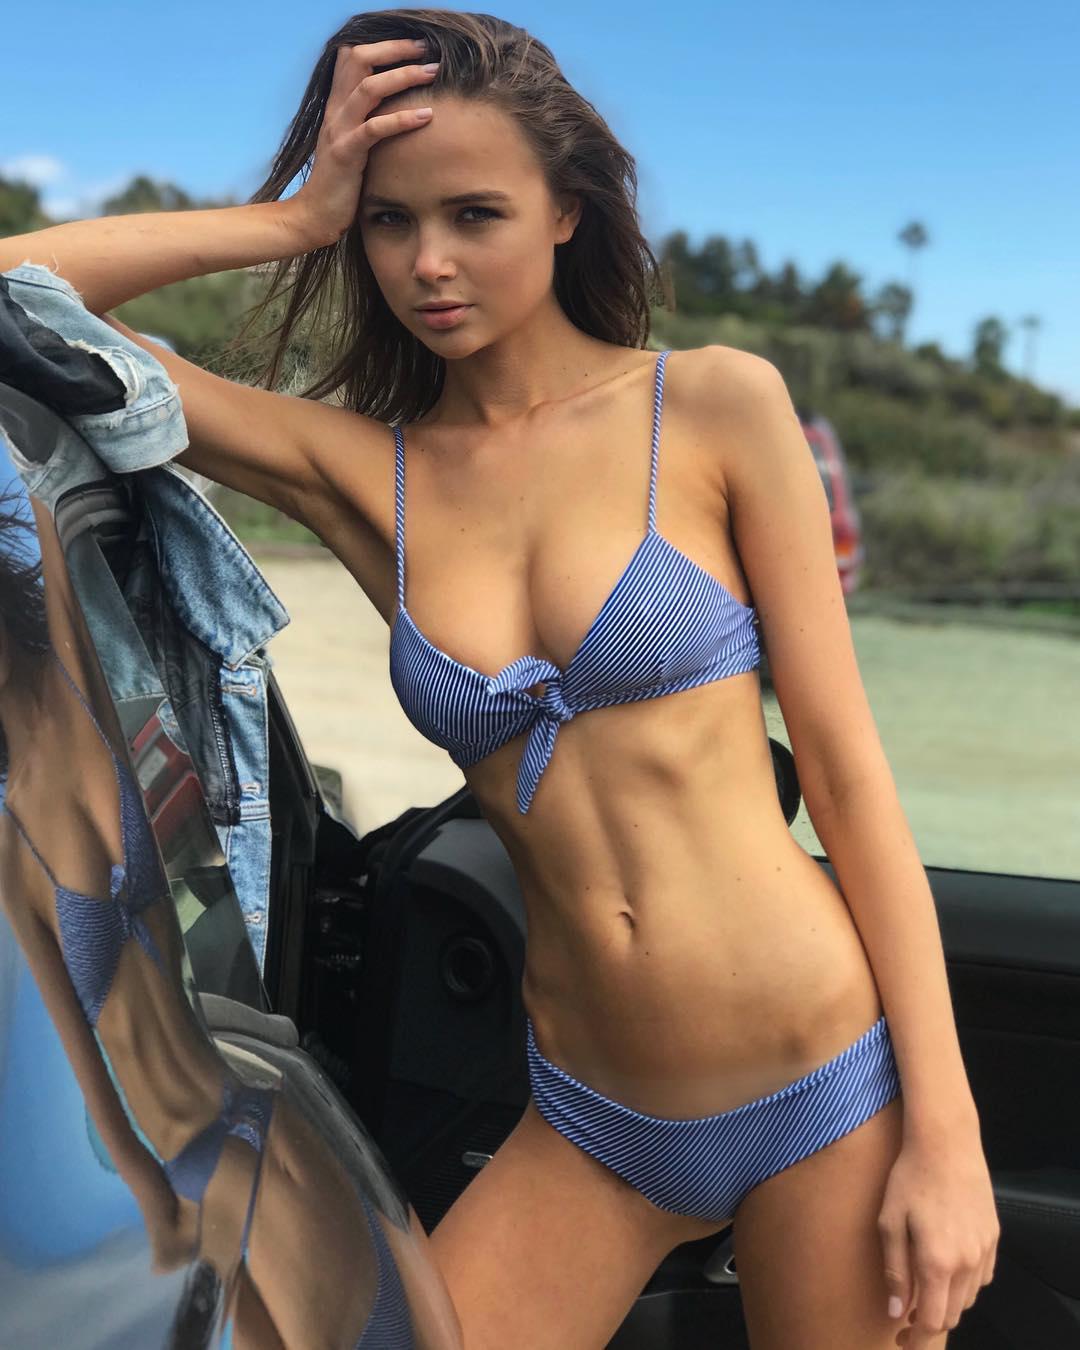 Hot Jana Jung nudes (57 photos), Pussy, Fappening, Feet, bra 2015